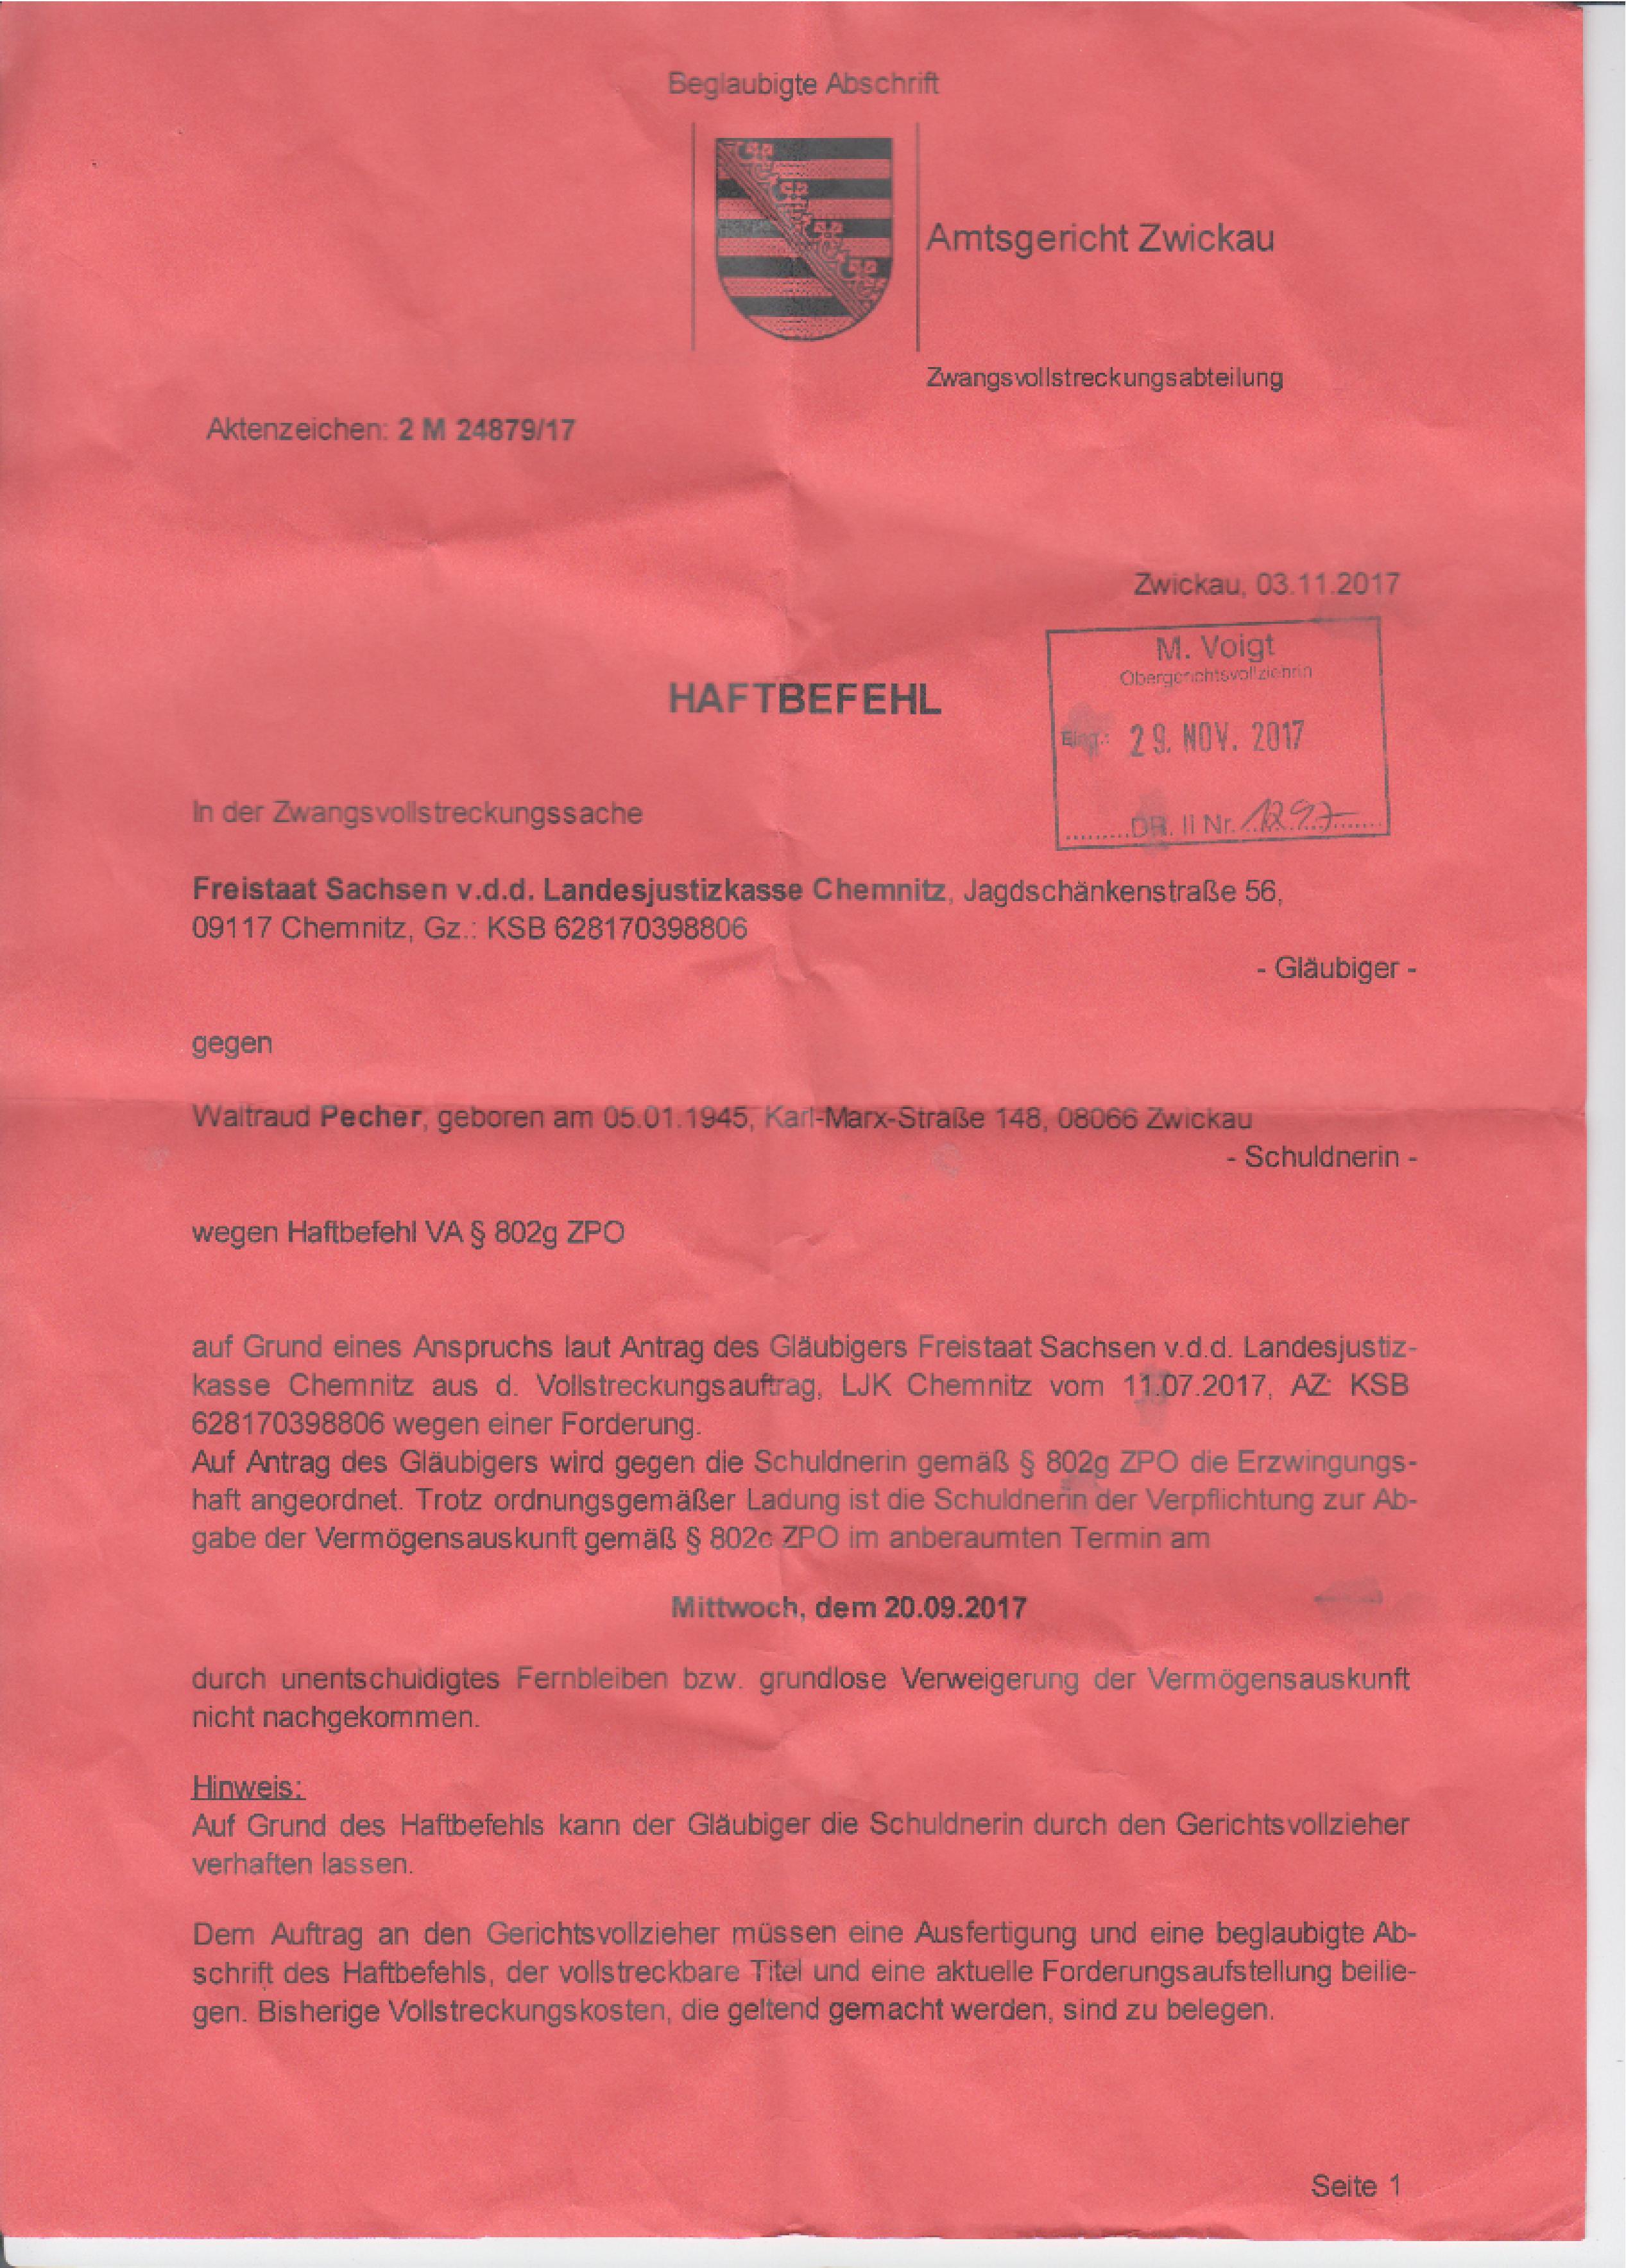 Der Rechtsstreit Mario Pecher Gegen Waltraud Pecher Oder Wie